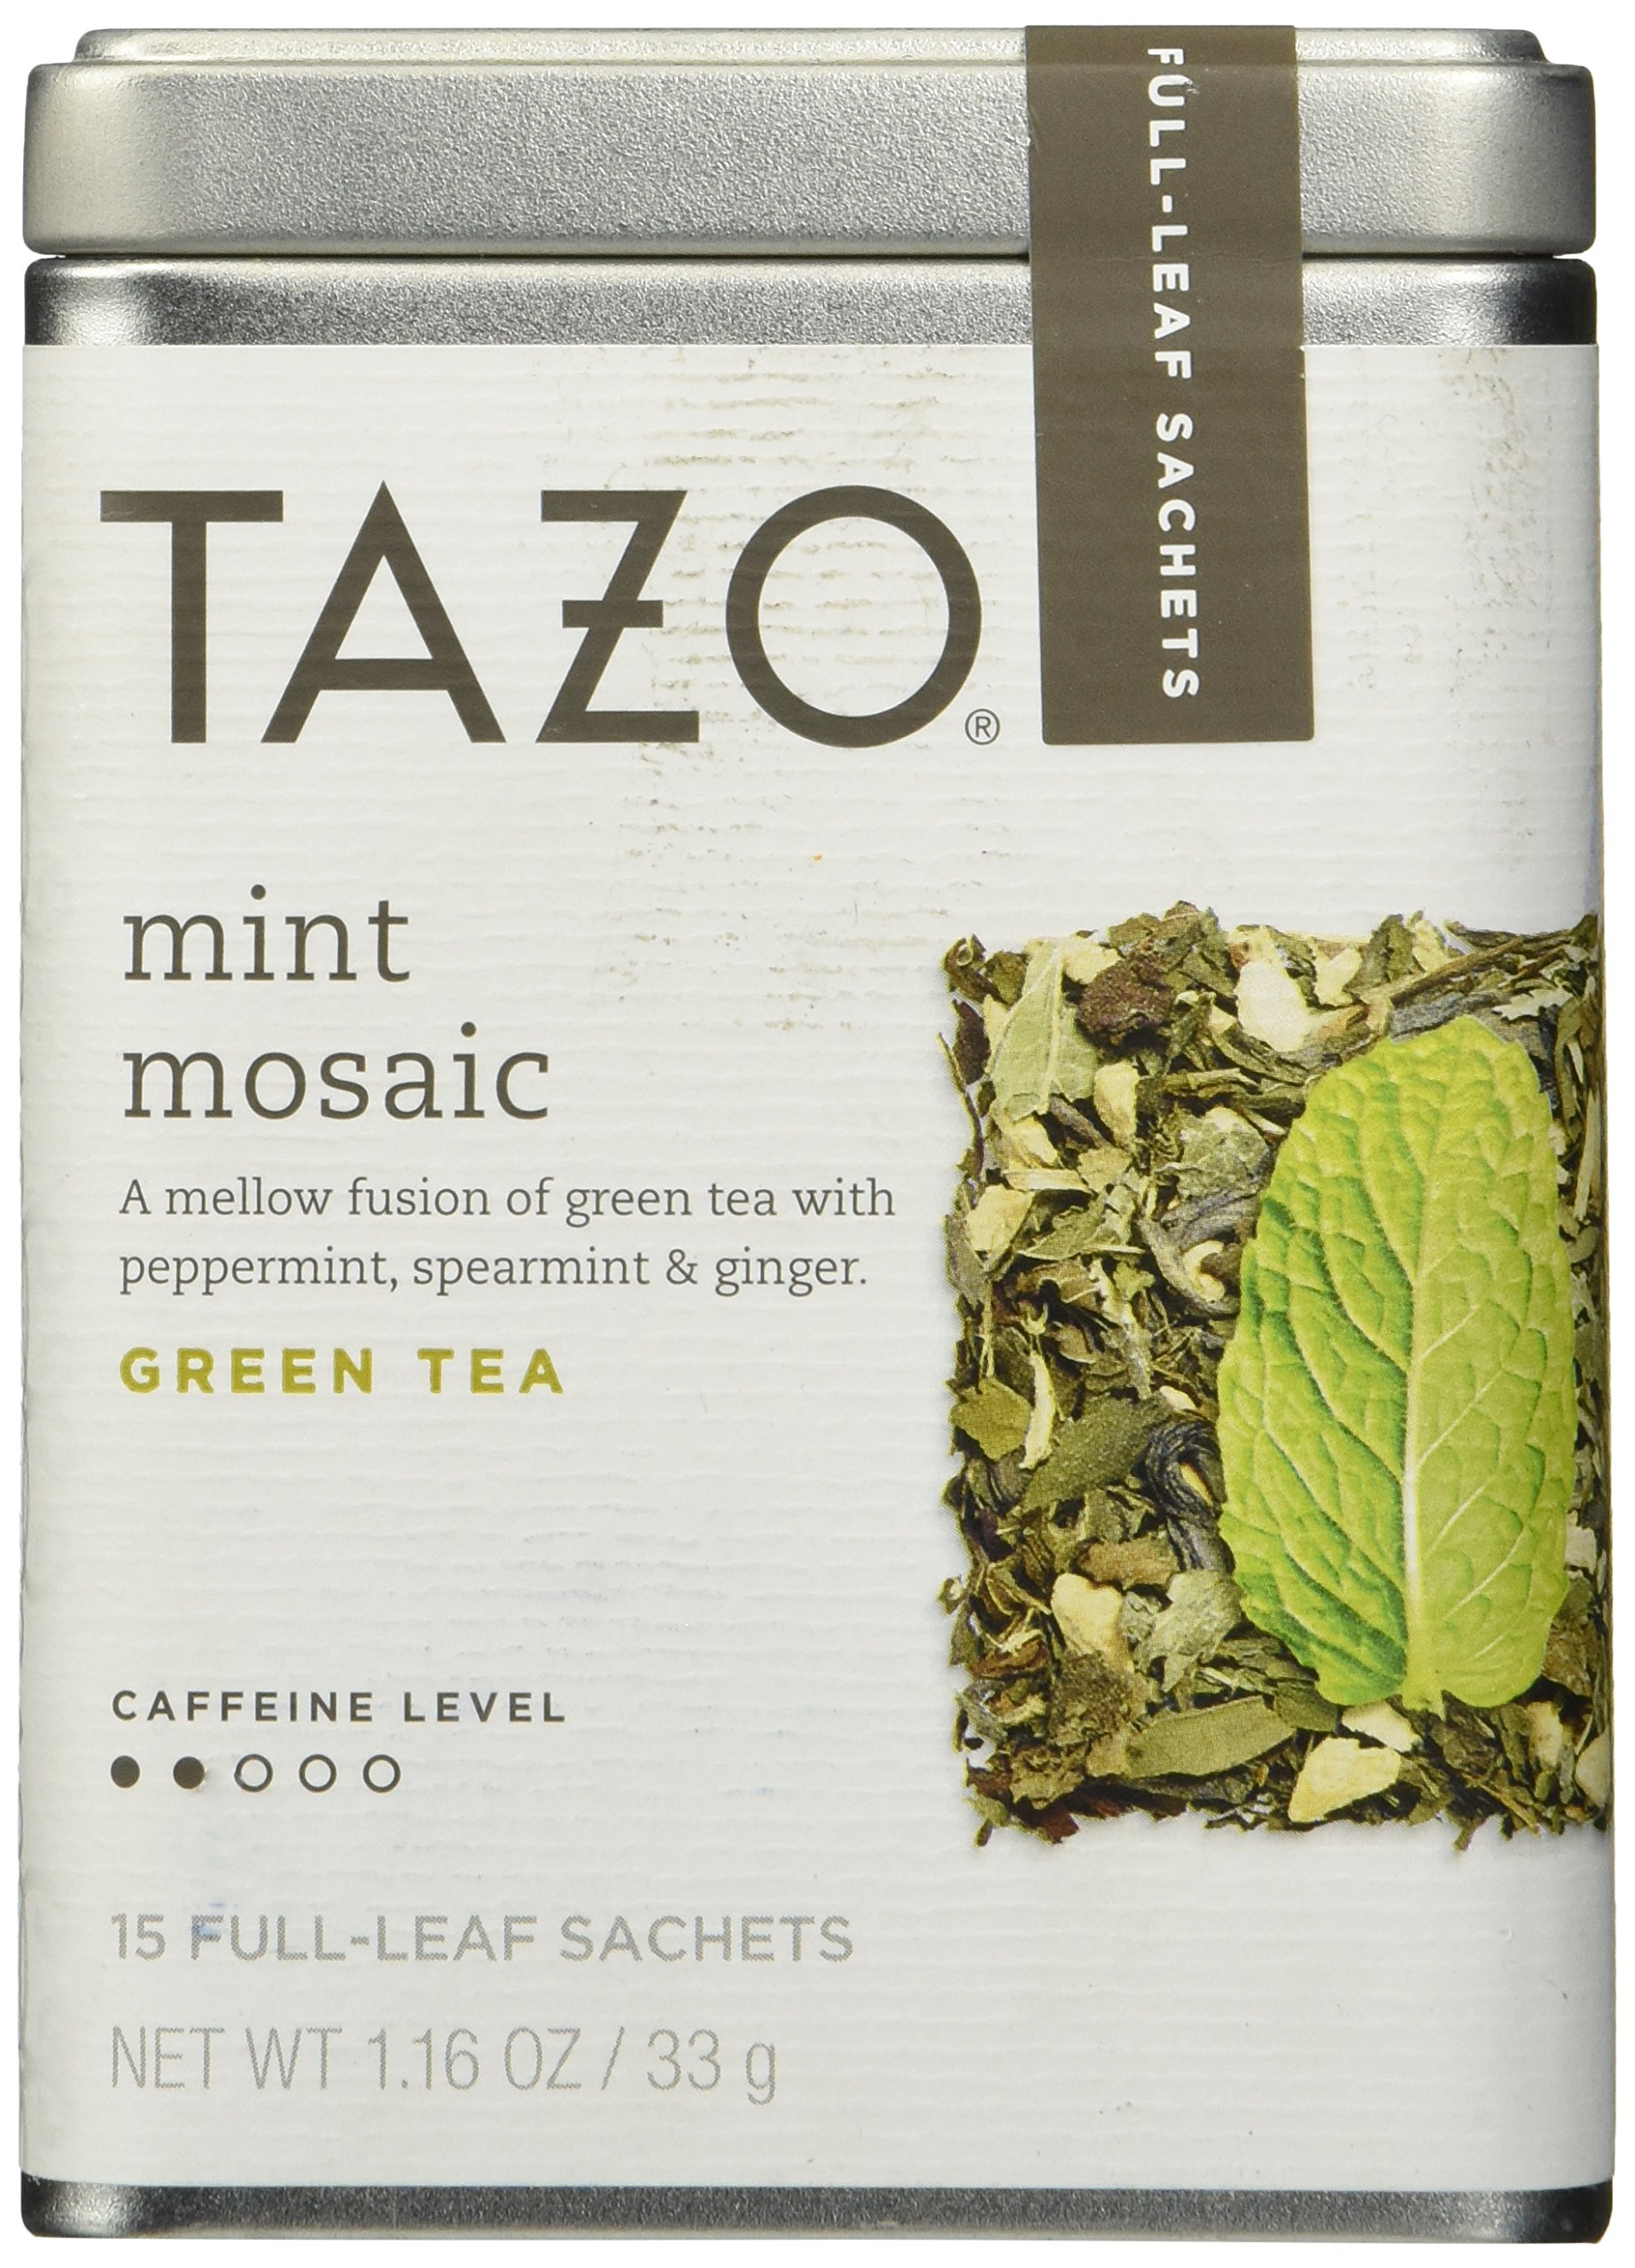 Tazo Mint Mosaic Green Tea, 1 Pack with 15 Full-Leaf Sachets